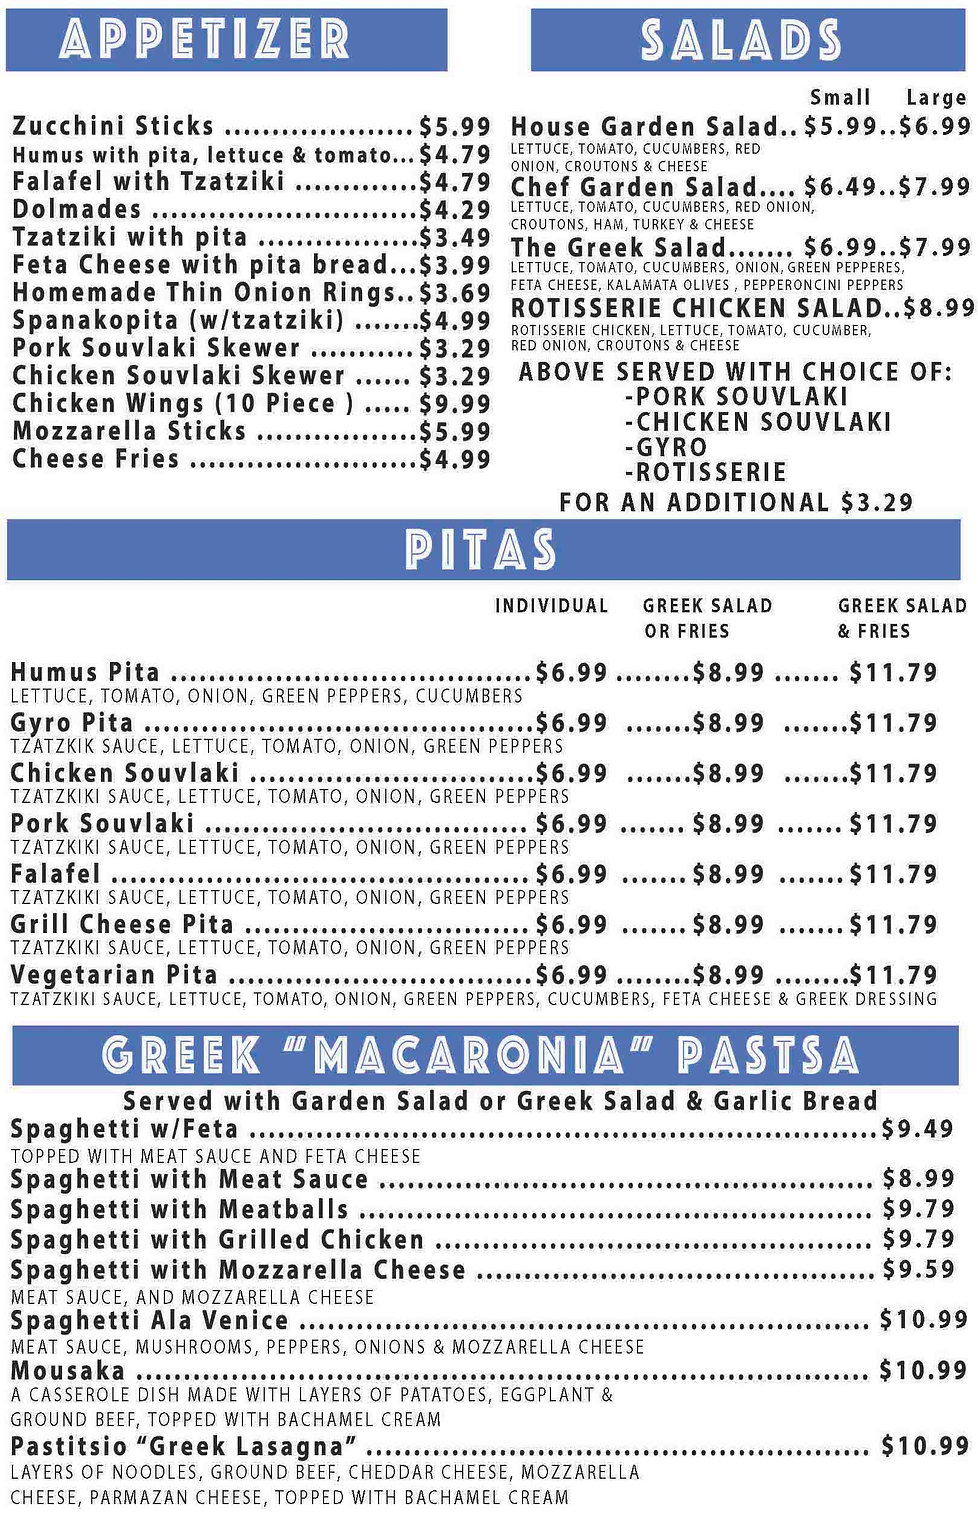 GreekGrillBACK111.jpg